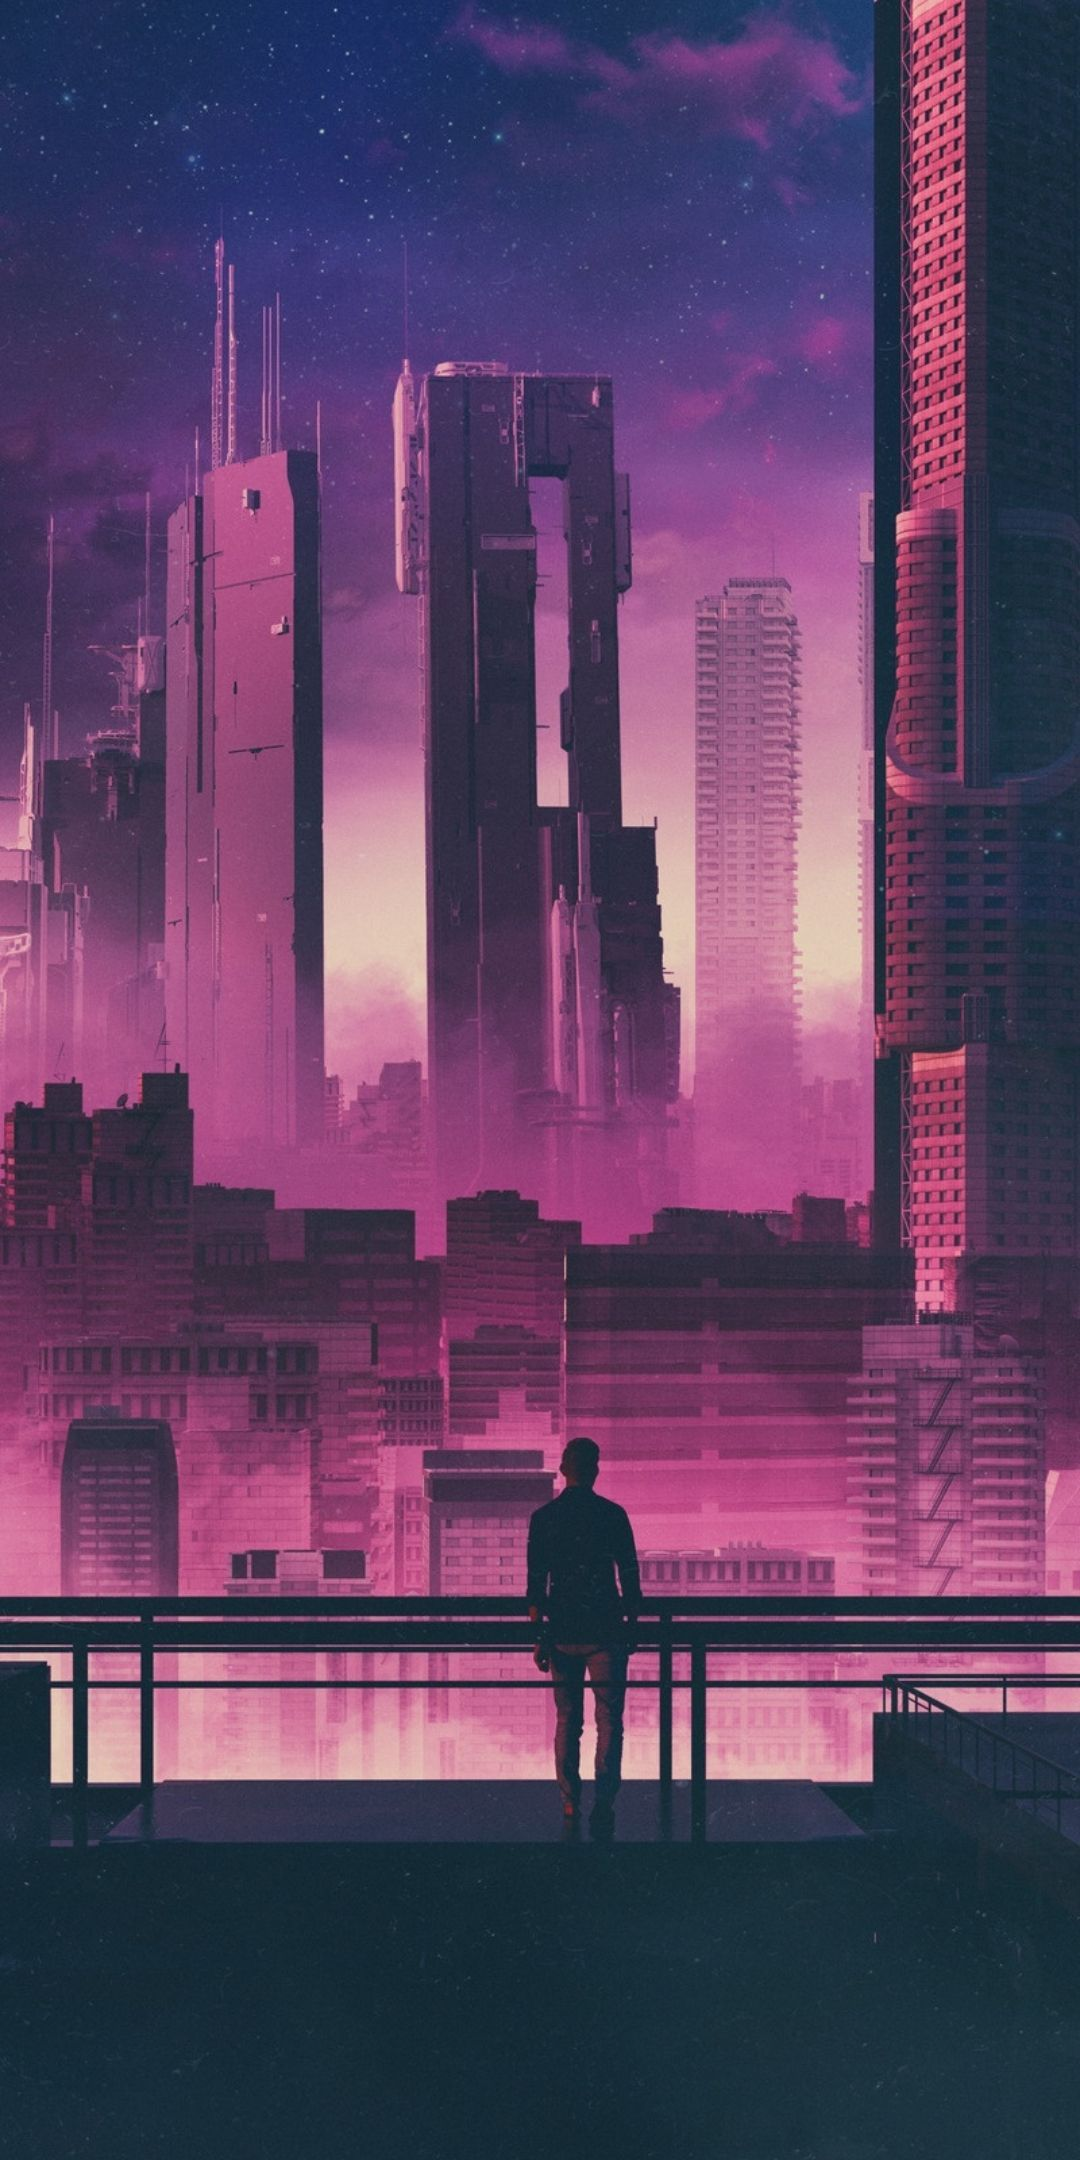 Cyberpunk Iphone Wallpapers Top Free Cyberpunk Iphone